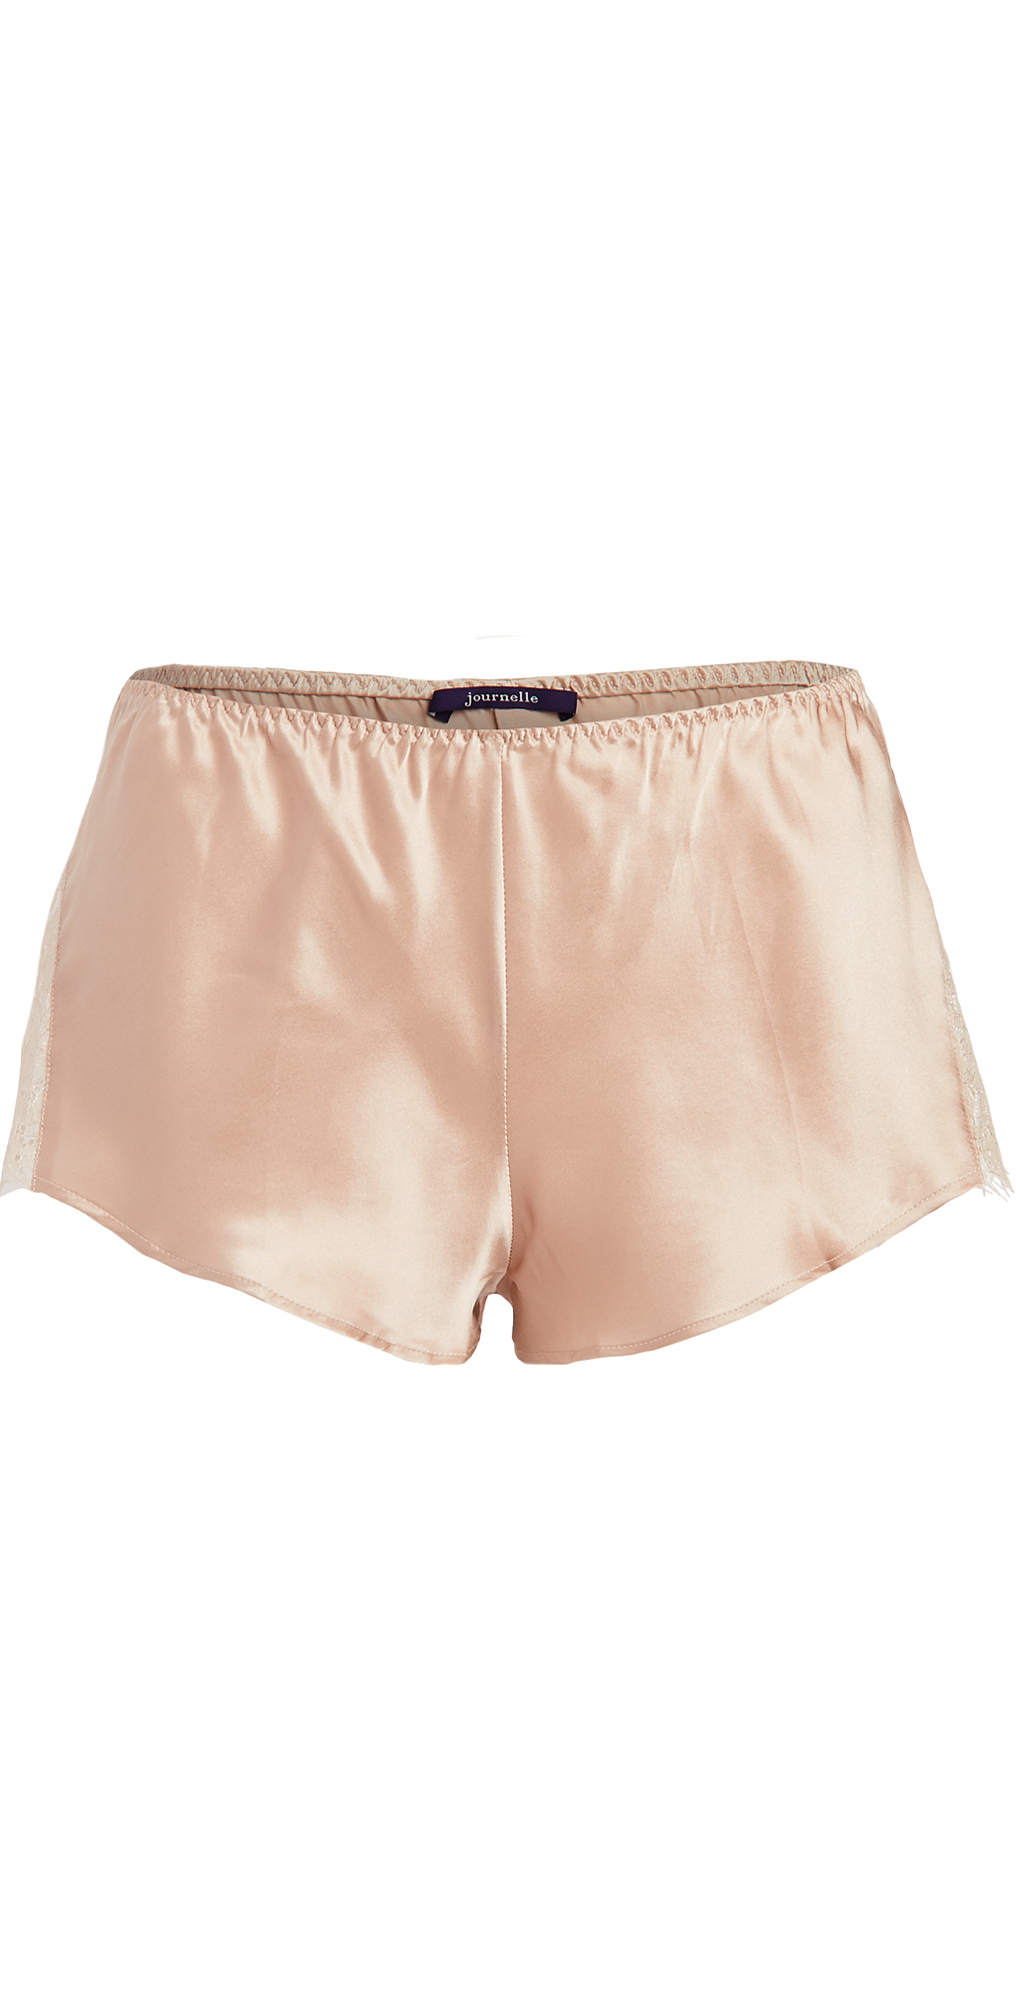 Charlotte Tap Shorts